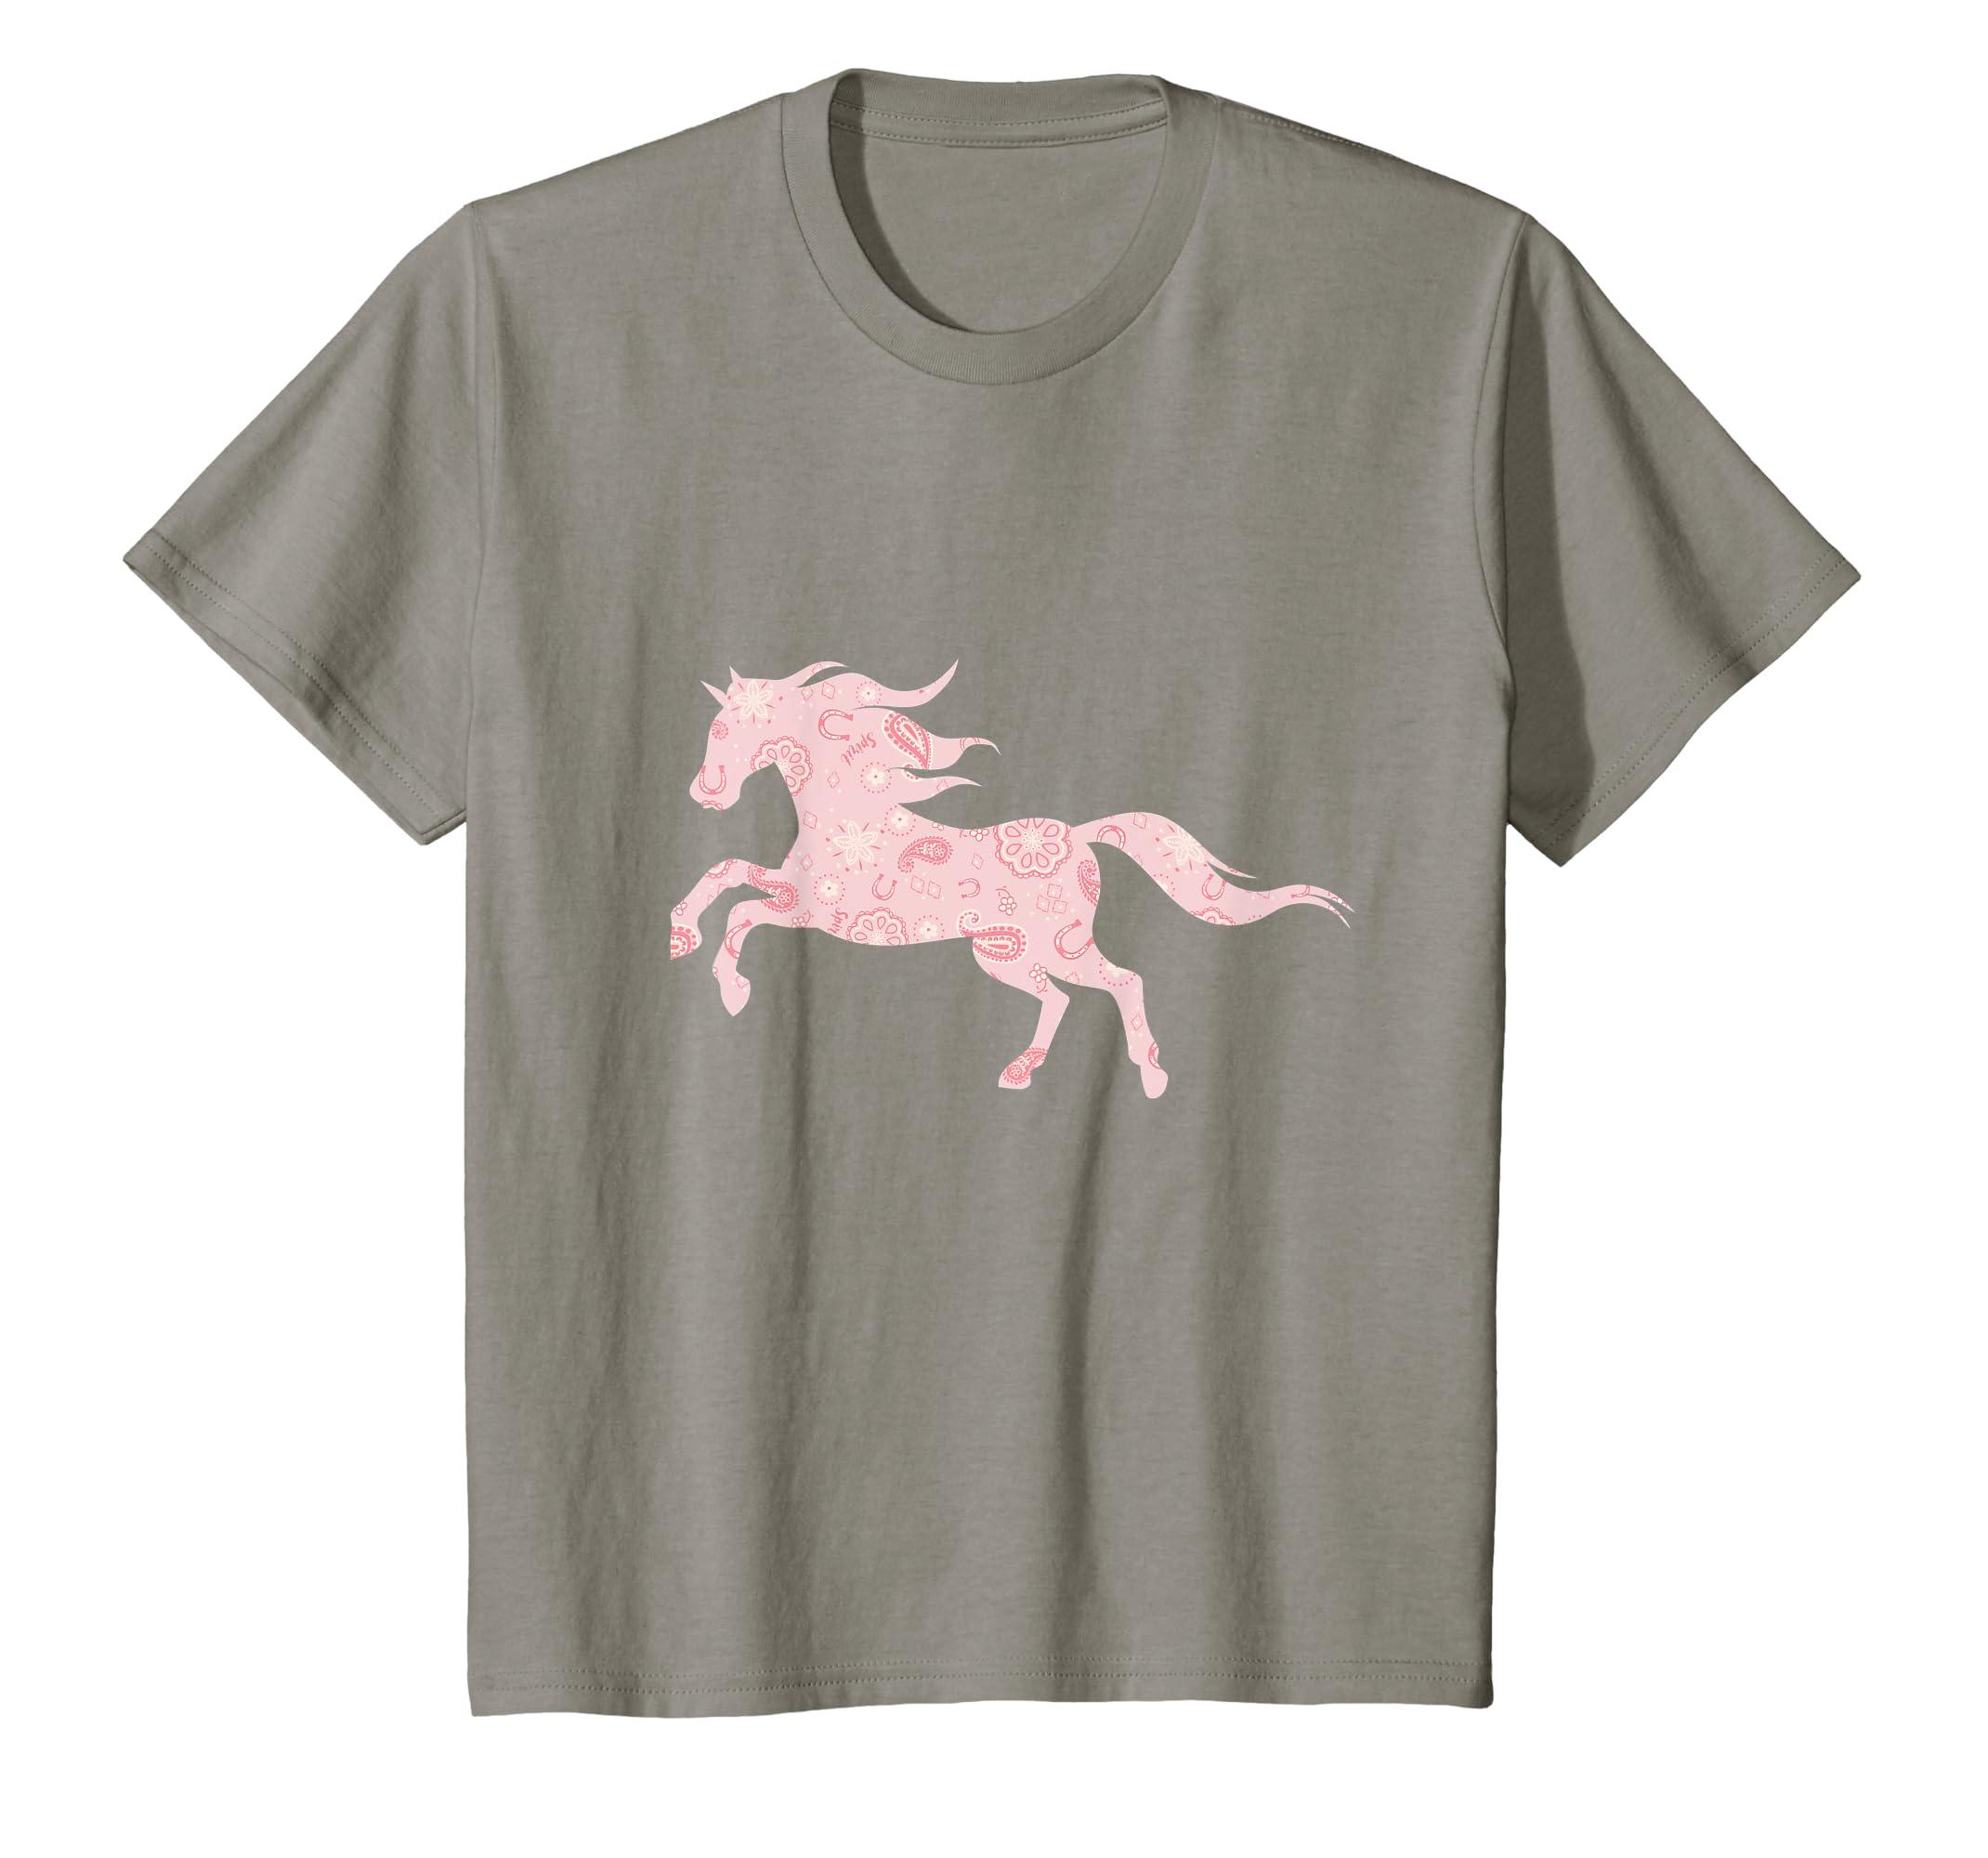 da65ea9fd Amazon.com: Kids DreamWorks Spirit Riding Free - Pink Horse T-Shirt:  Clothing